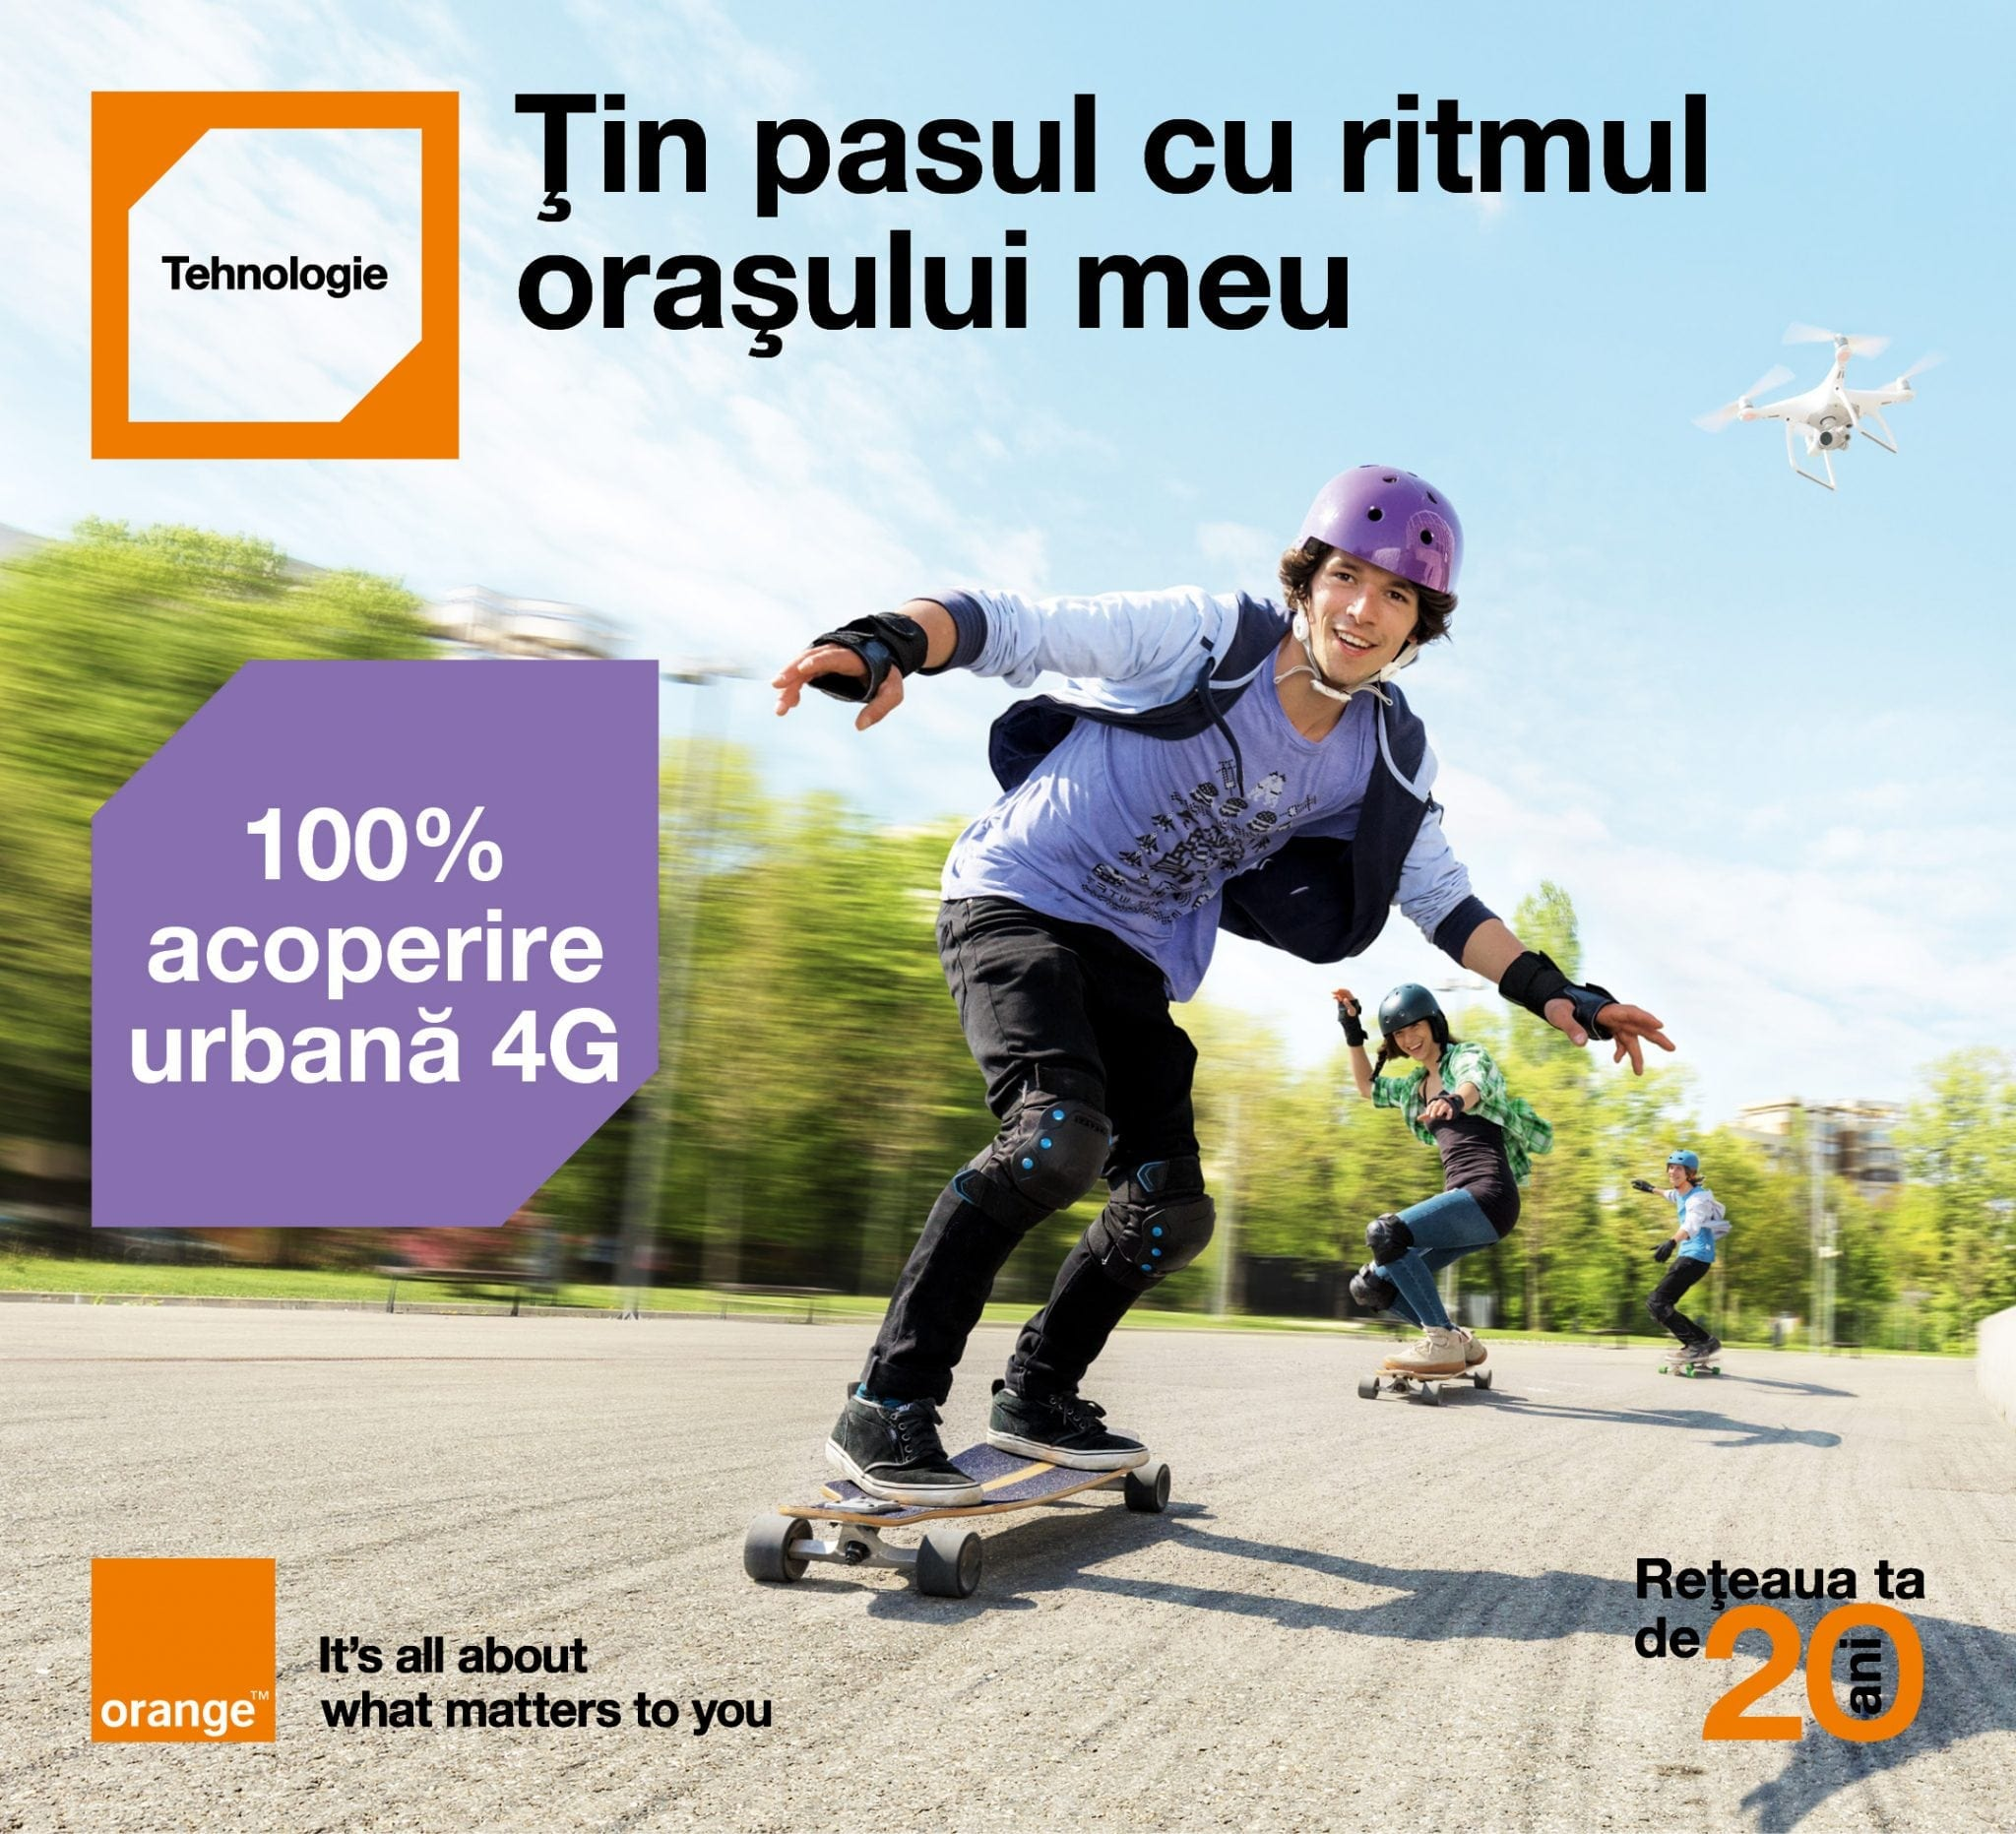 Orange oferă acoperire 4G 100% la nivel urban